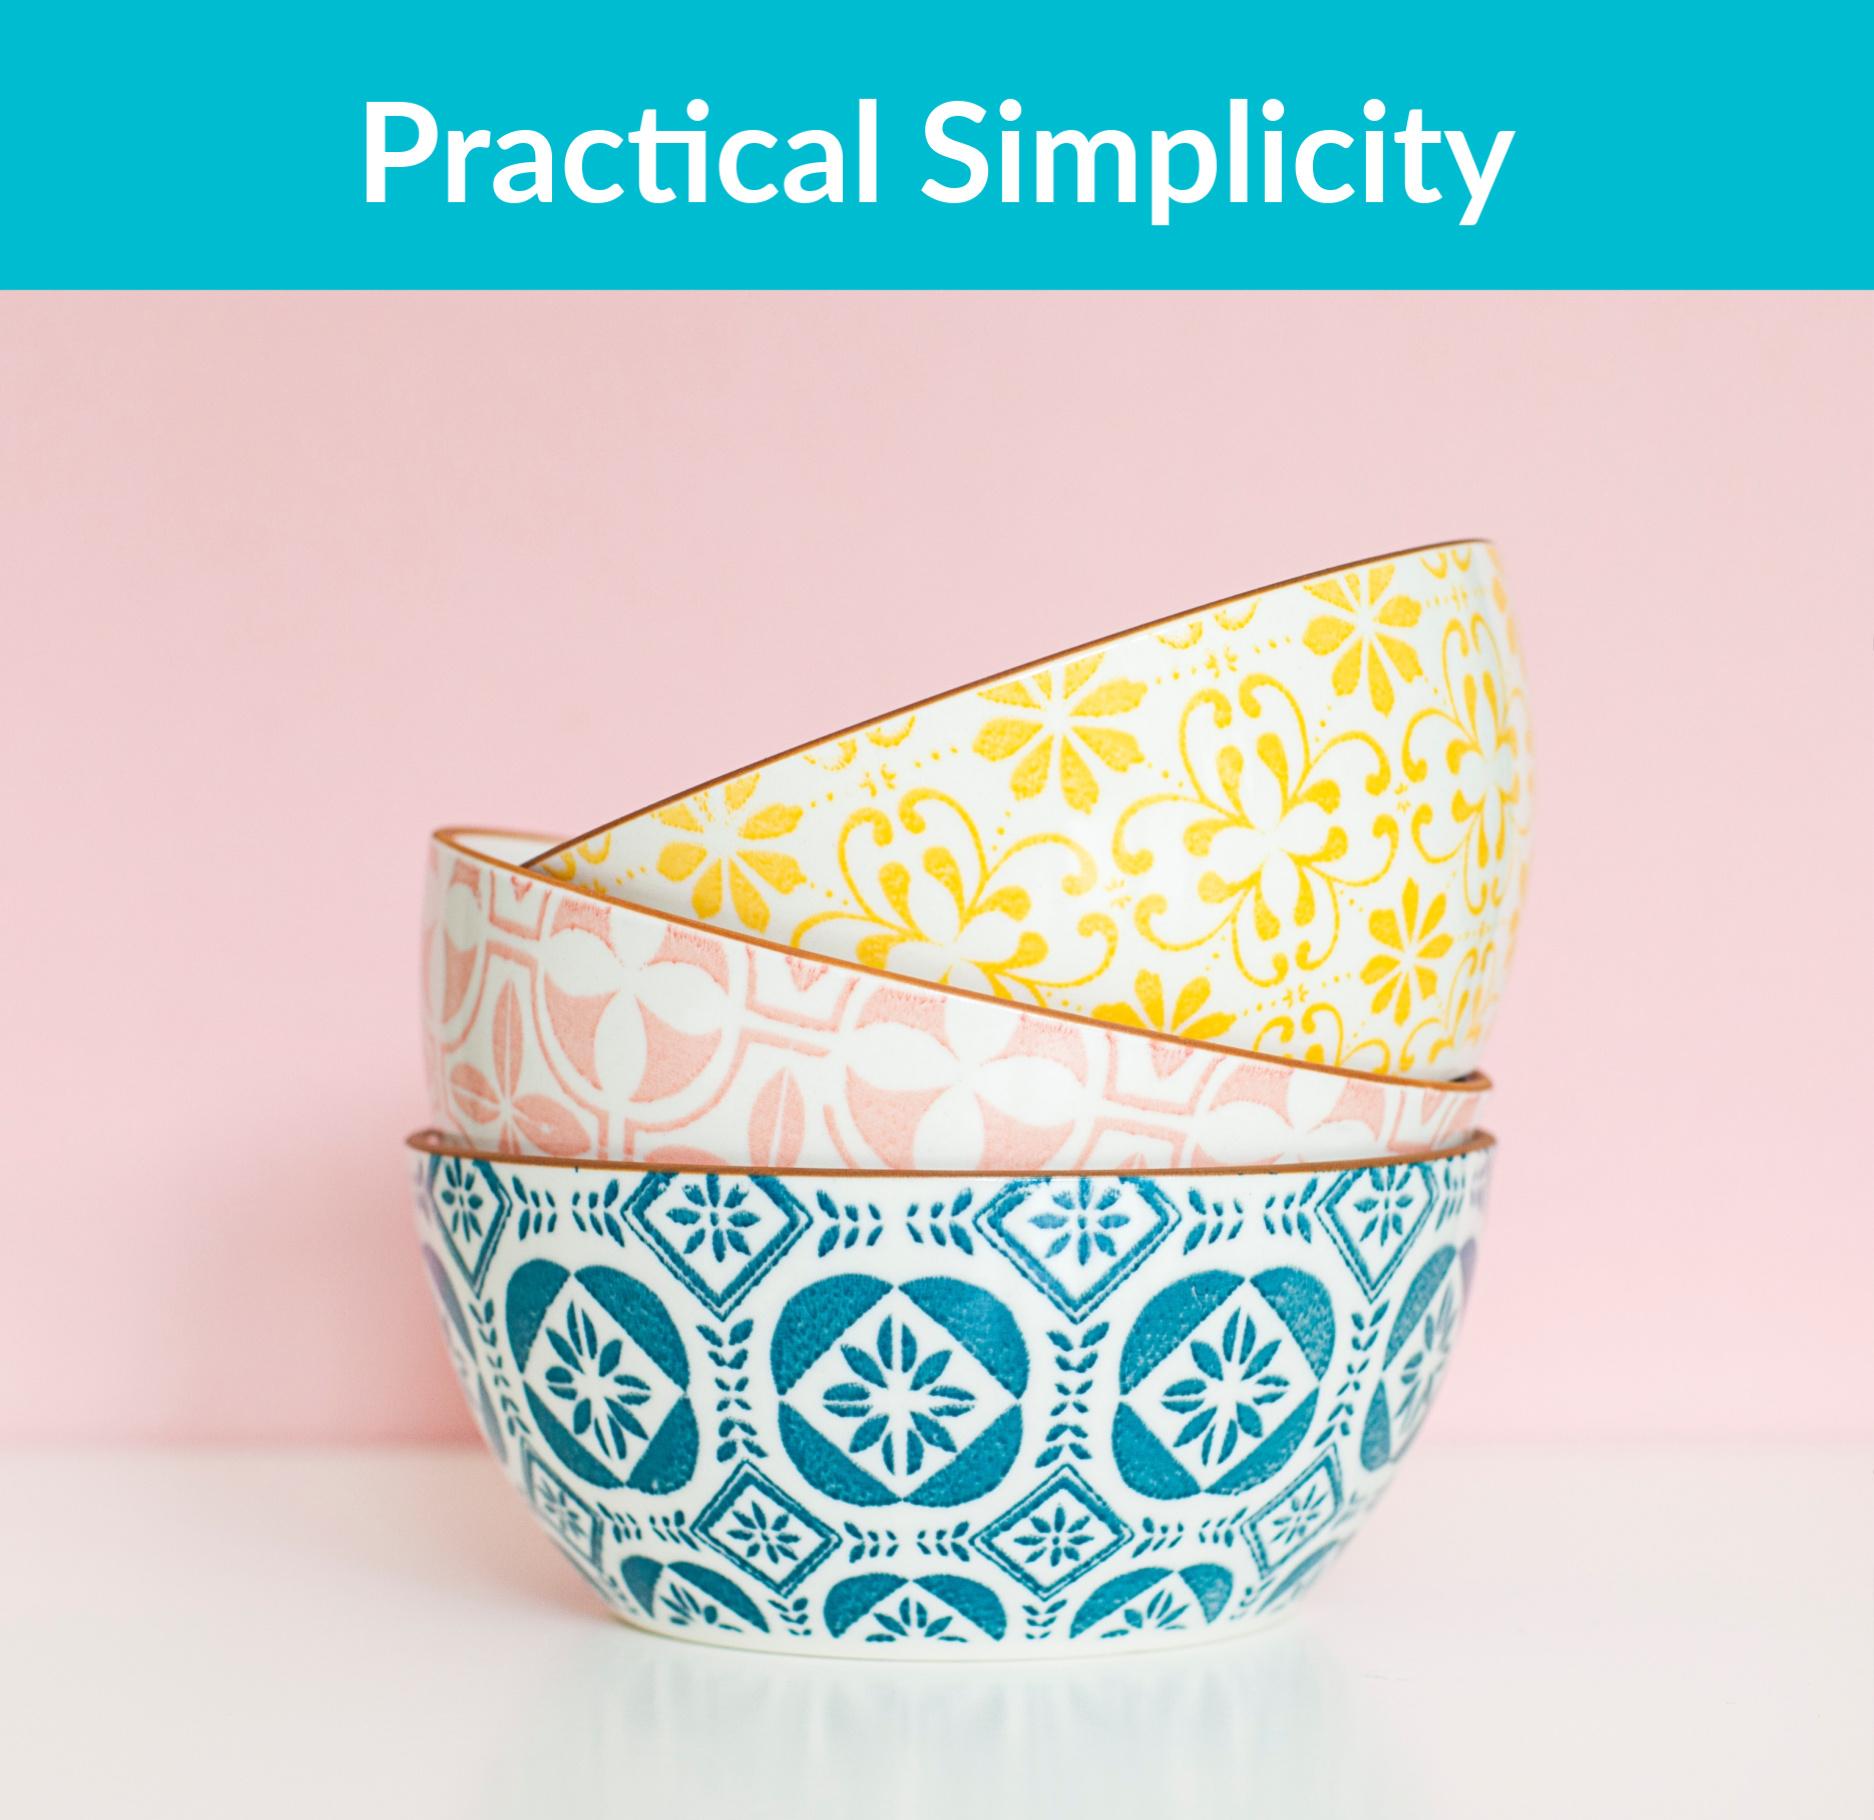 Practical Simplicity (1)